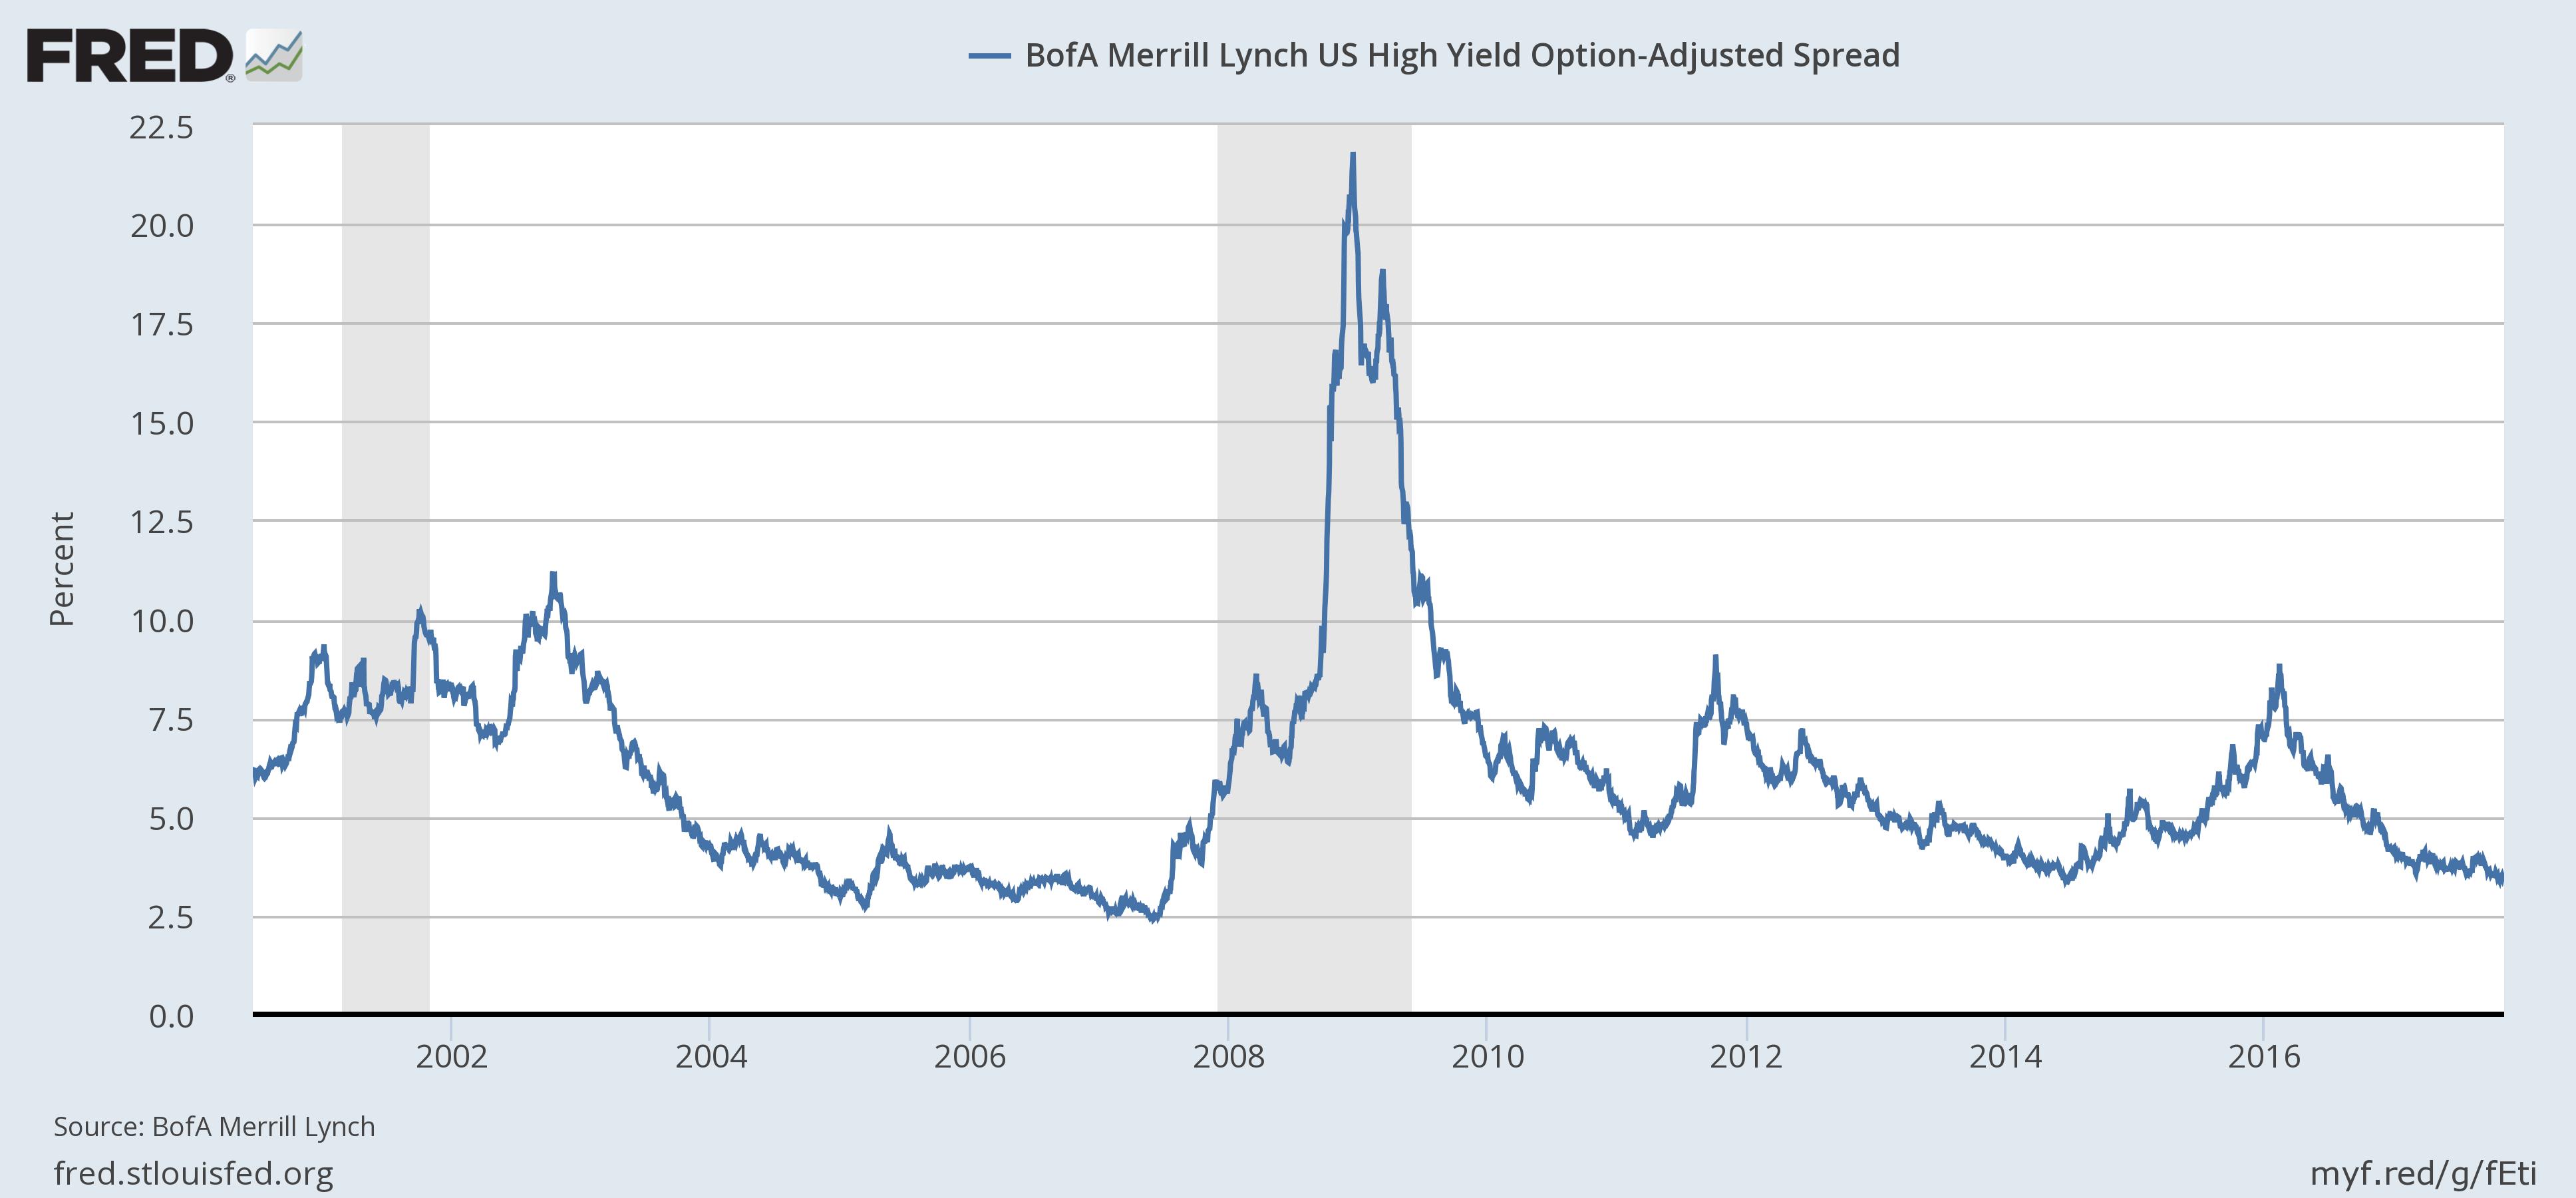 US BofA Merrill Lynch High Yield Option, 2002 - 2016